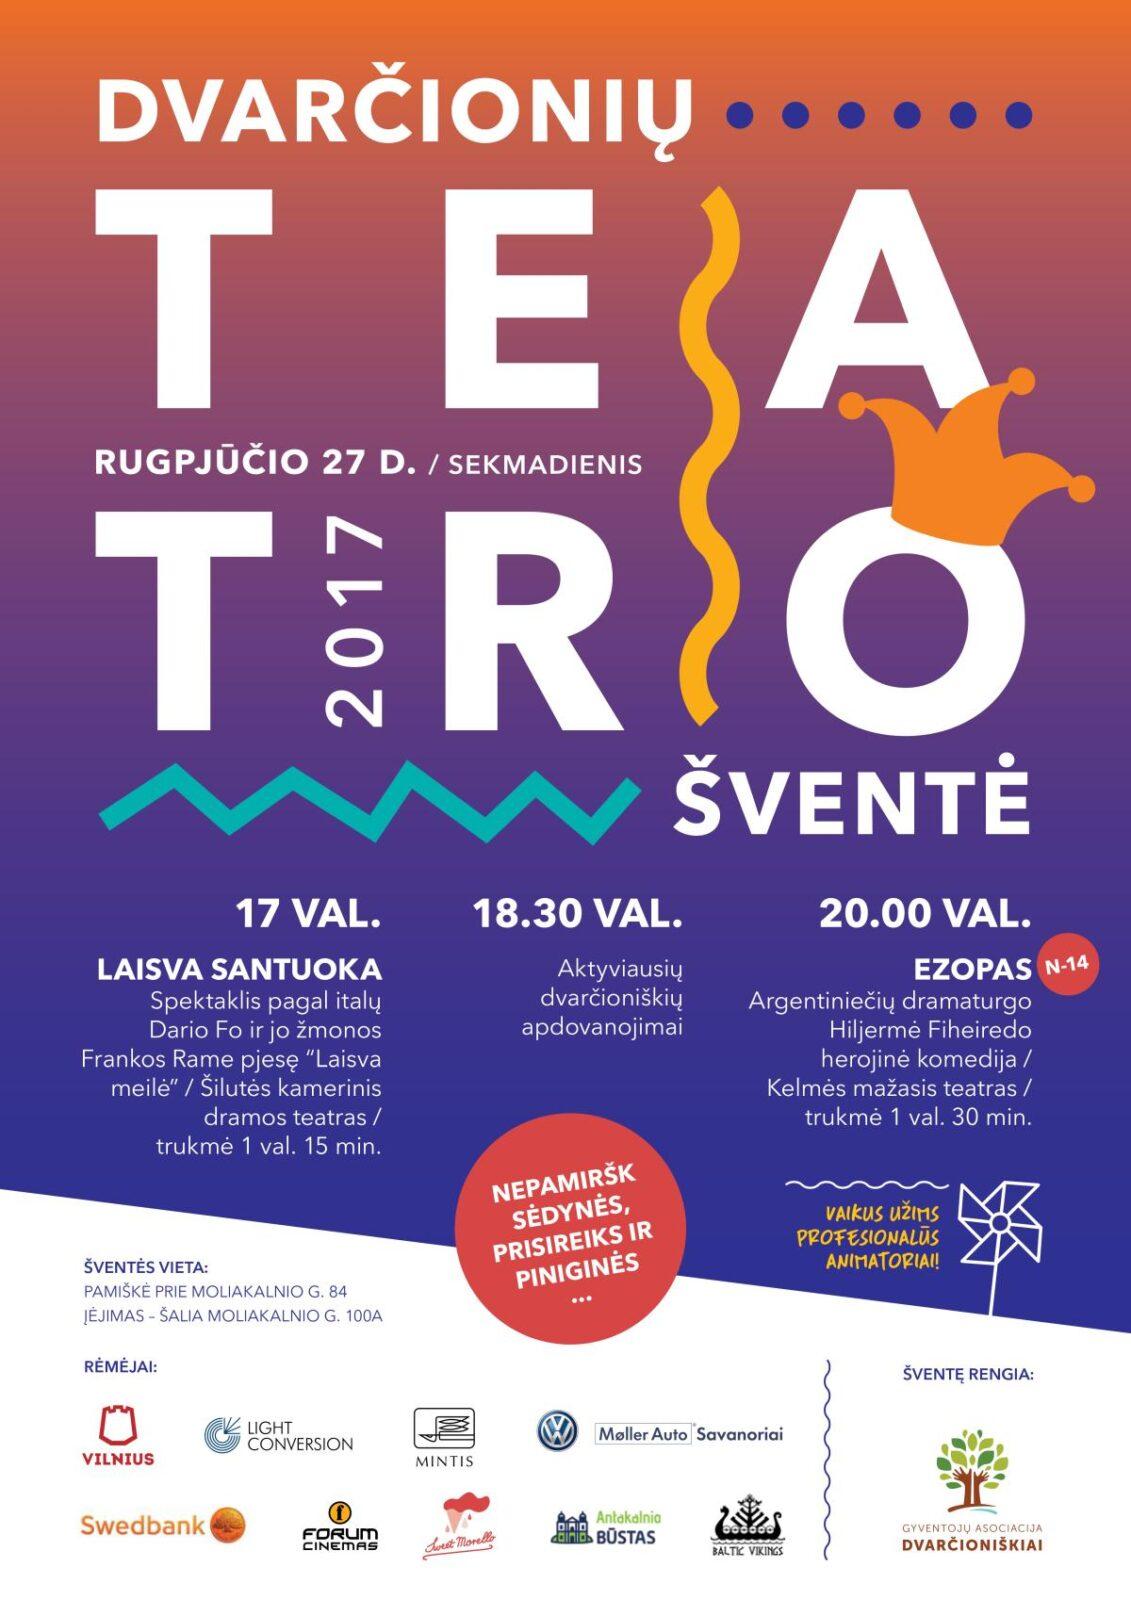 Dvarčionyse vyks teatro festivalis